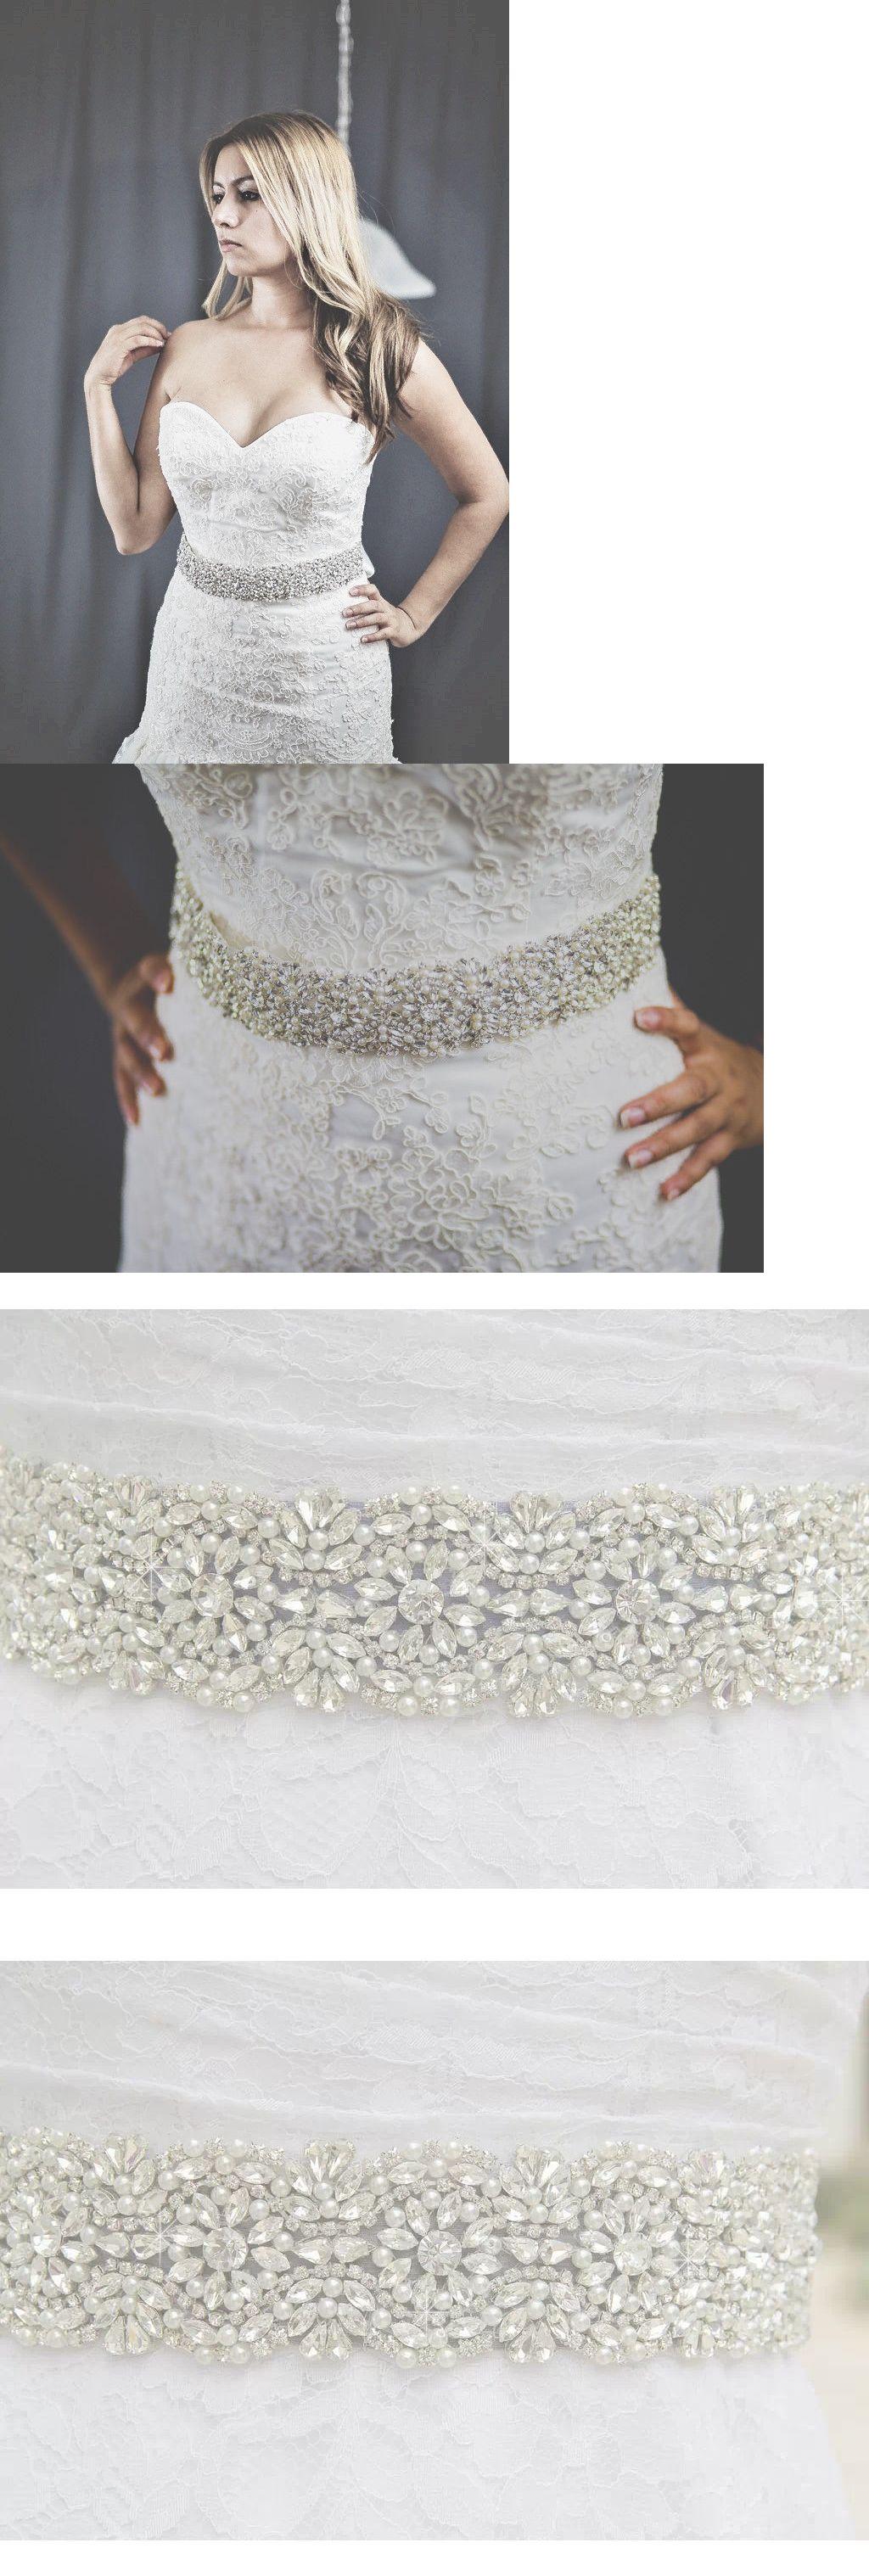 Pearl belt for wedding dress  Other Bridal Accessories  Wedding Bridal Sash Belt Crystal